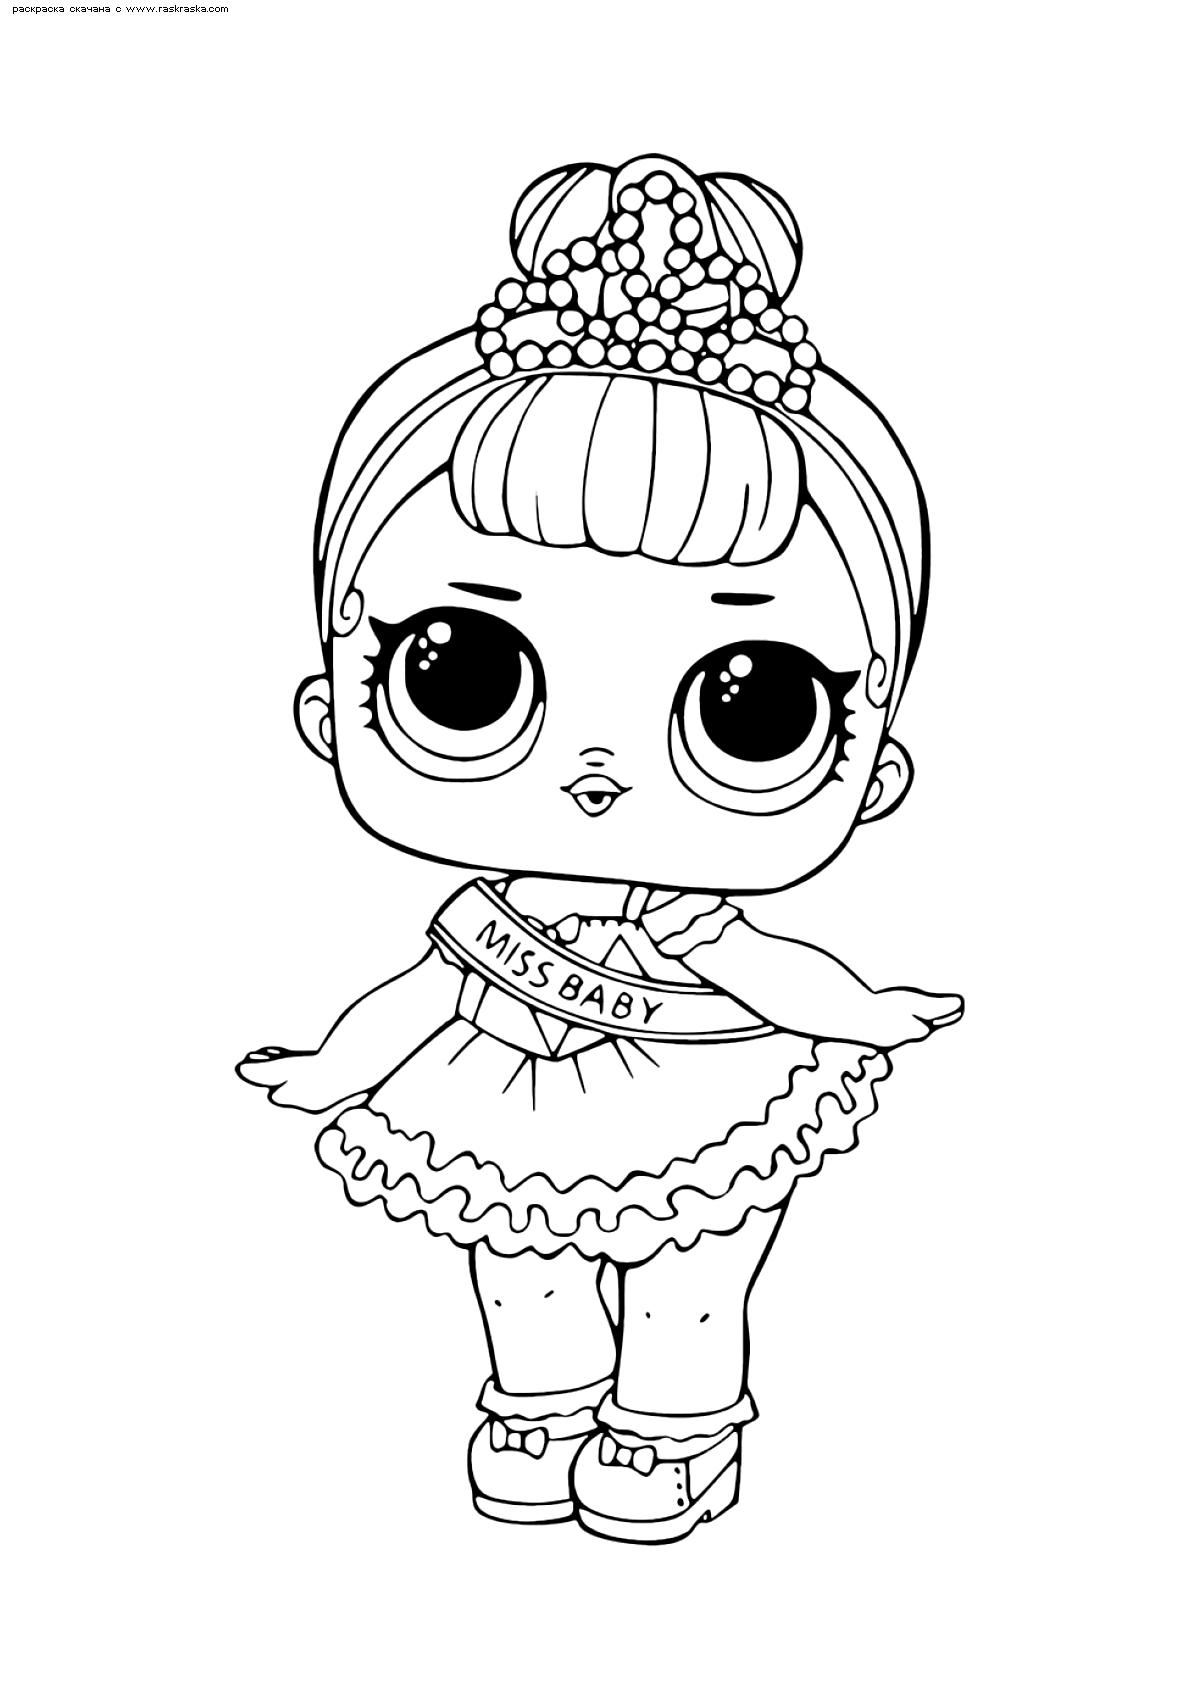 Раскраска ЛОЛ Miss Baby (Мисс Бэби) серия 1. Раскраска лол